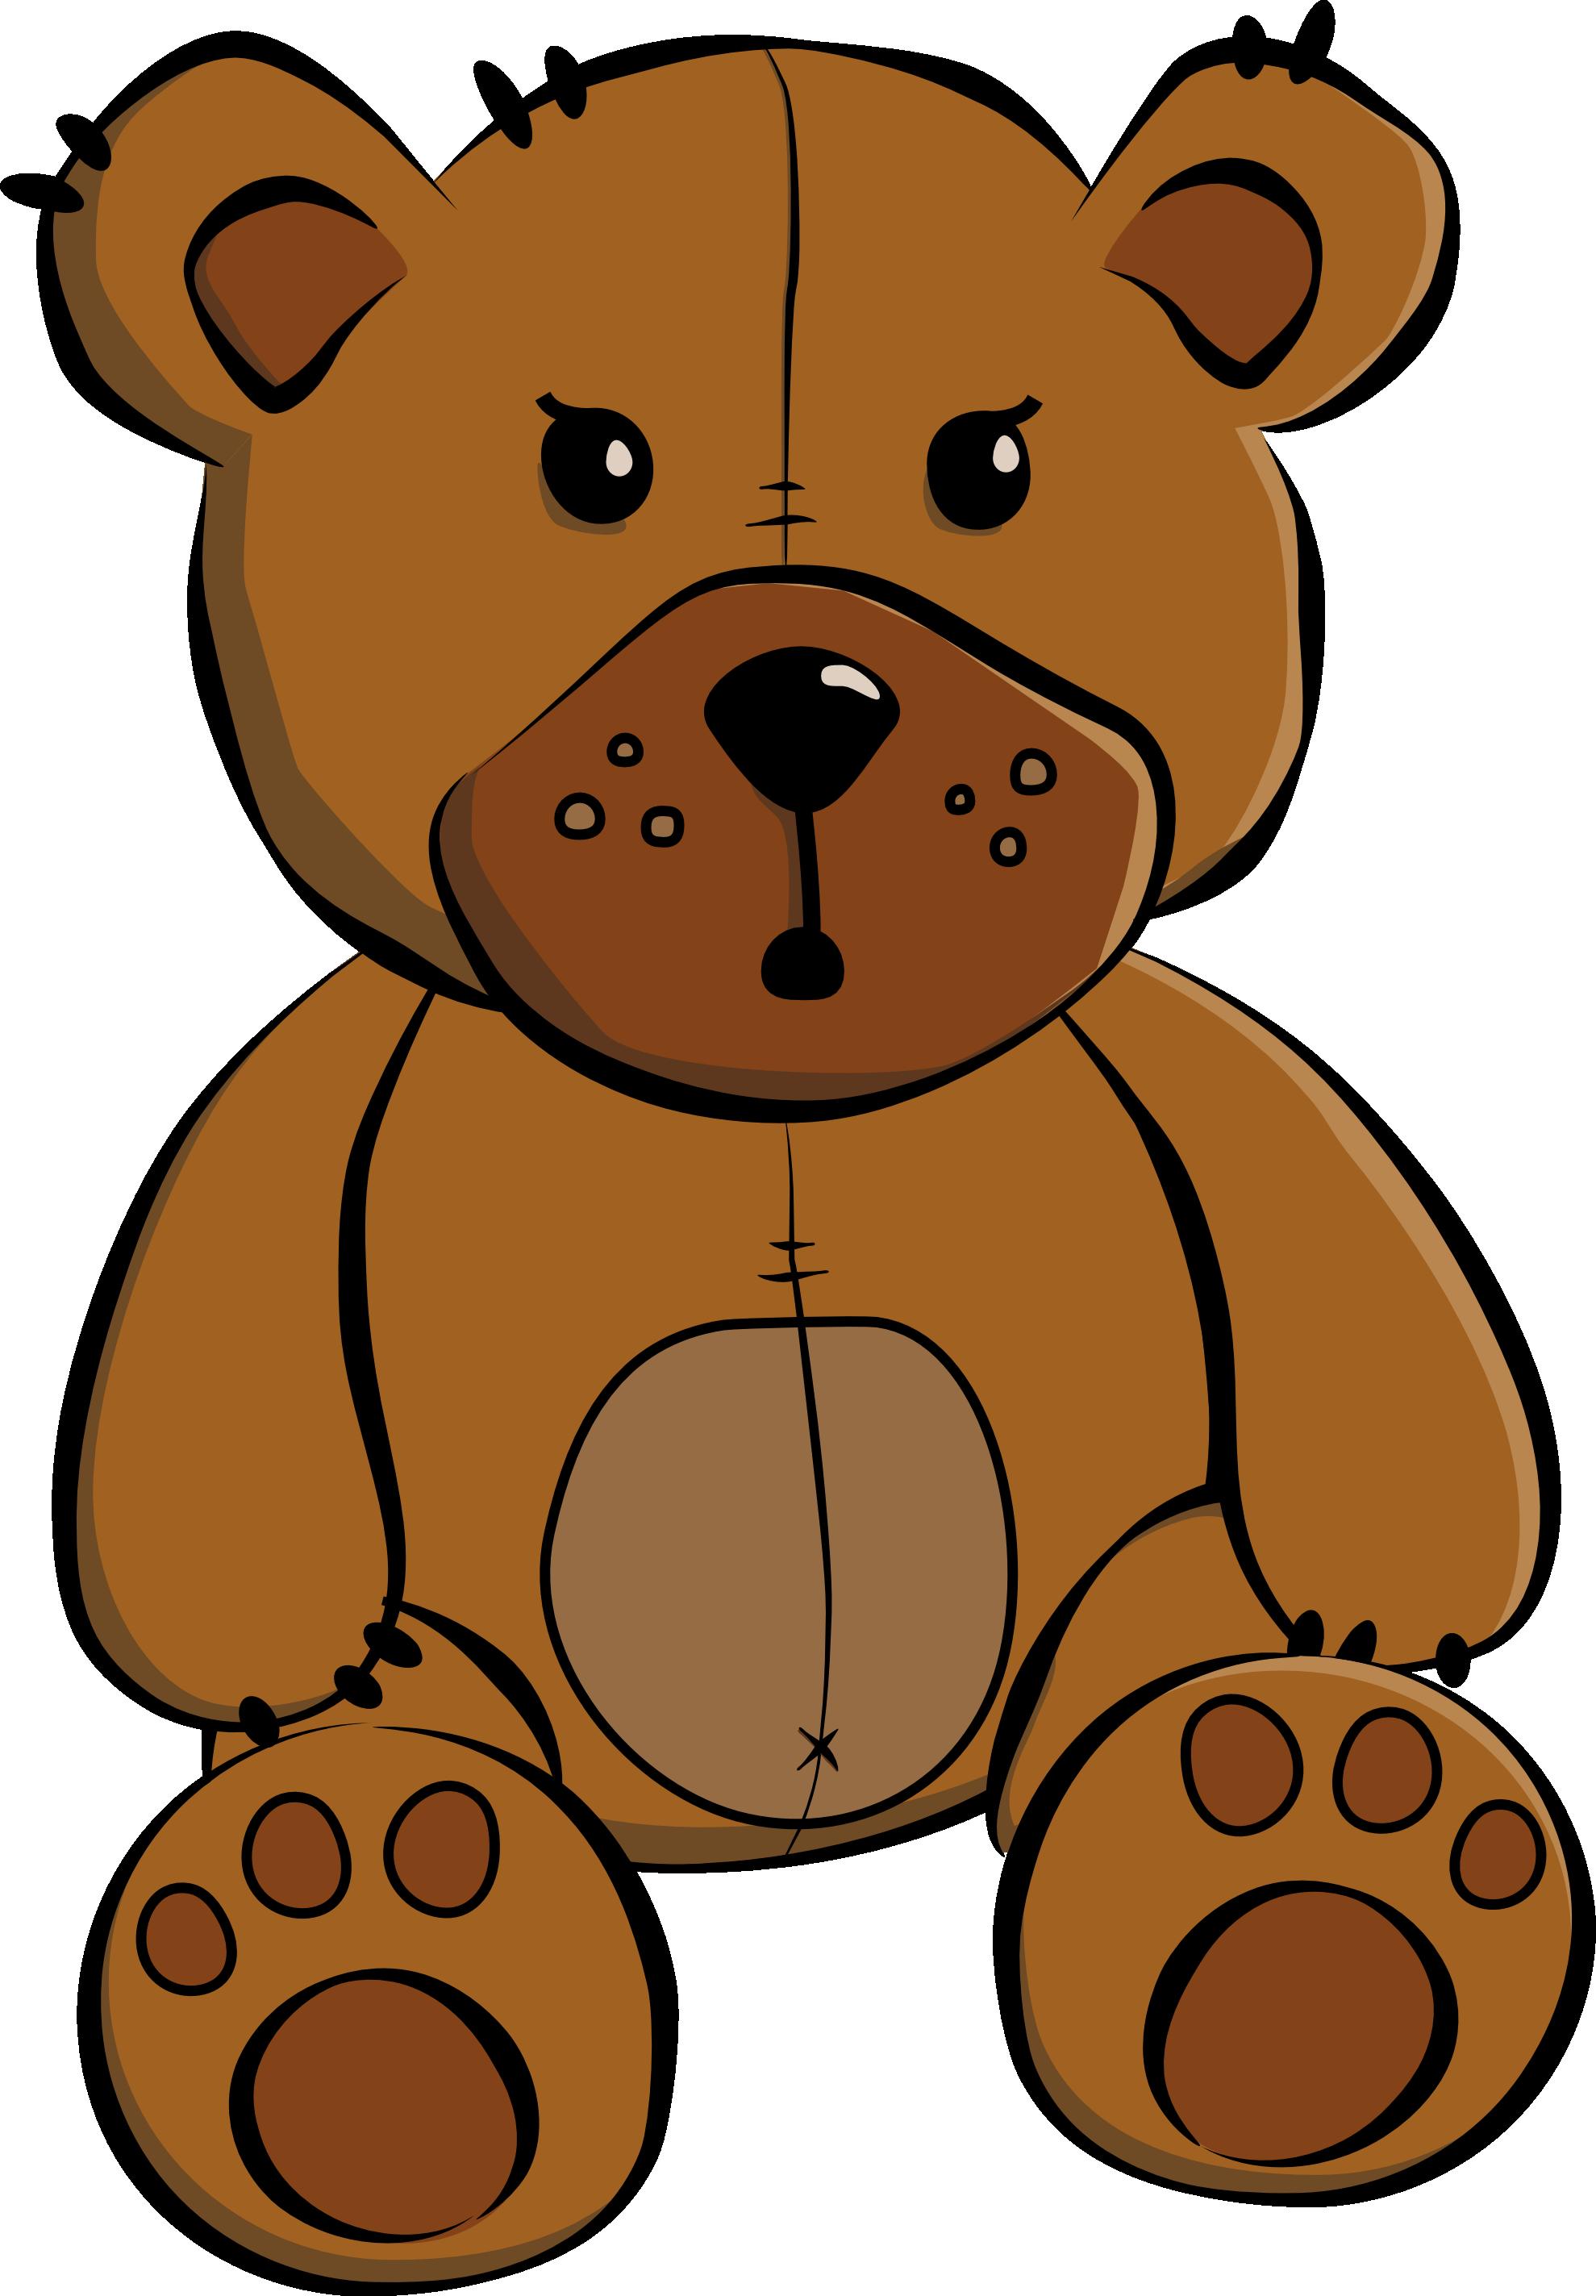 Free Bear Images Cartoon, Download Free Clip Art, Free Clip.